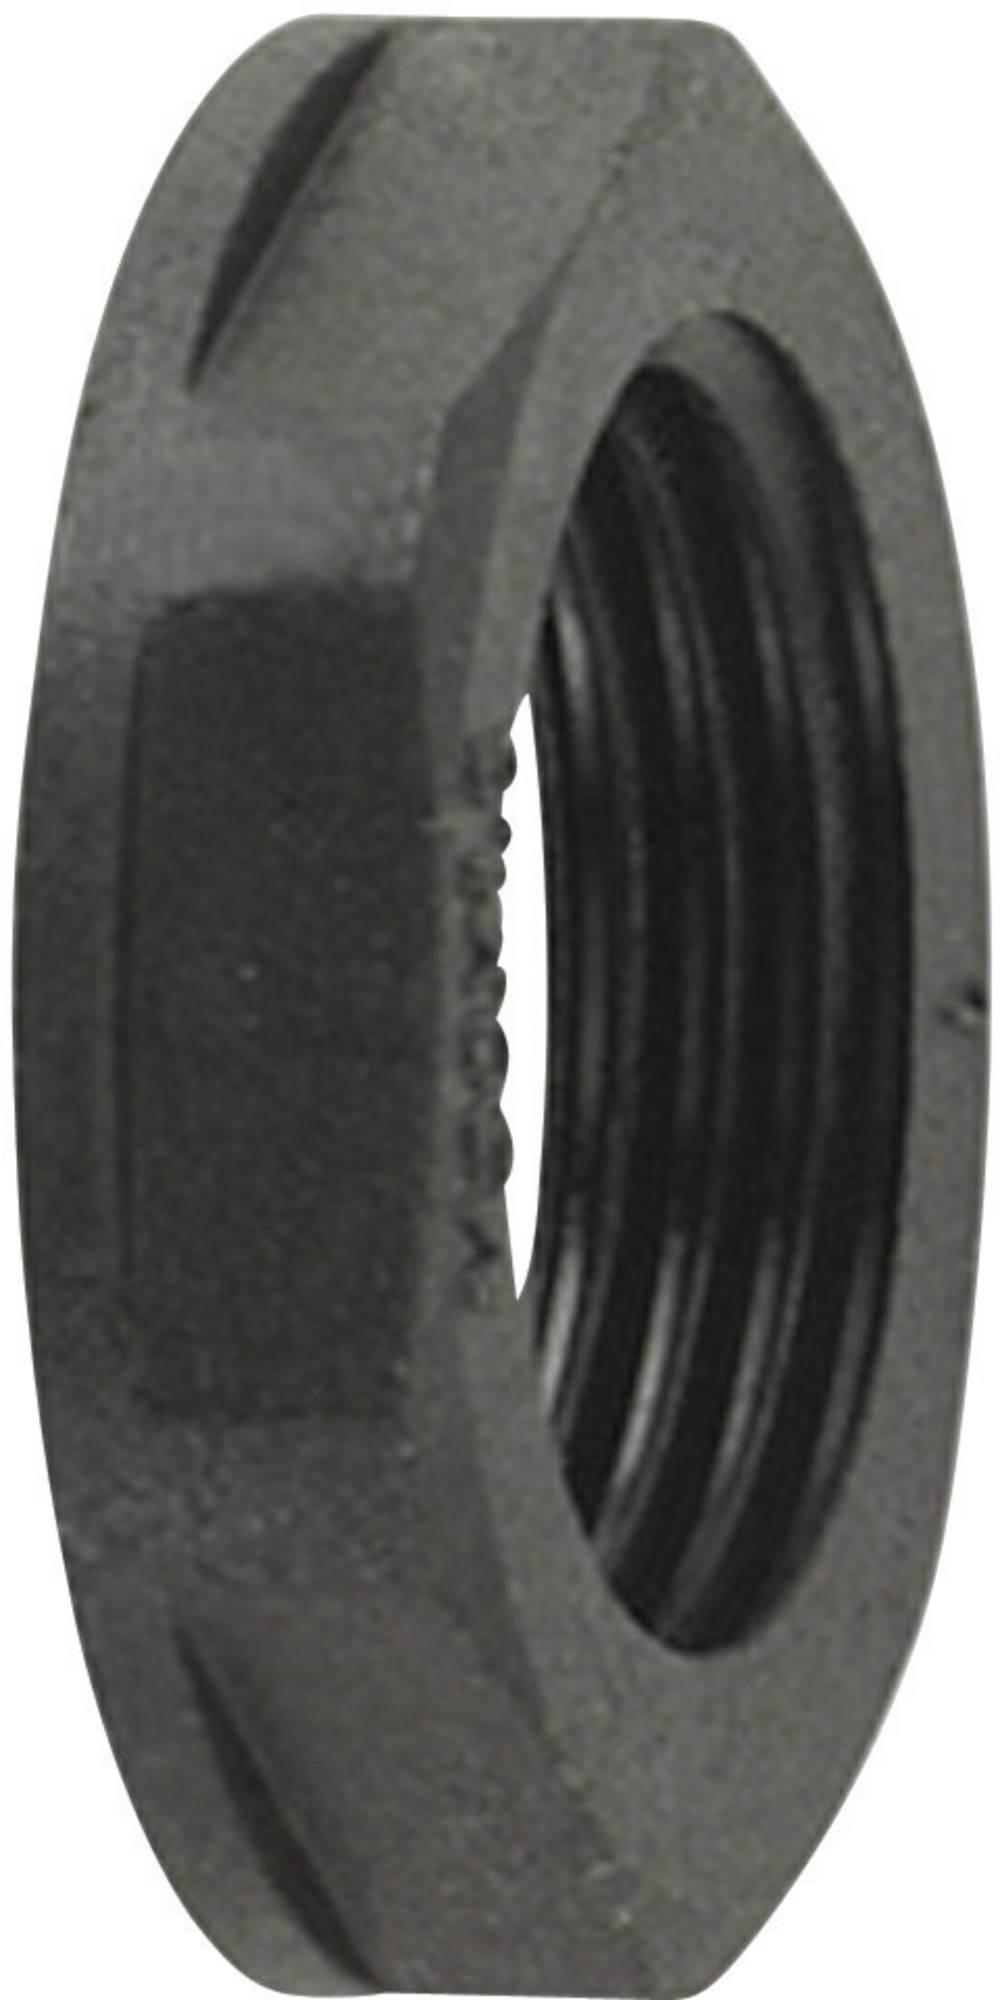 Protimatica HellermannTyton HelaGuard ALPA-PG36, črne barve,vsebina: 1 kos 166-50148